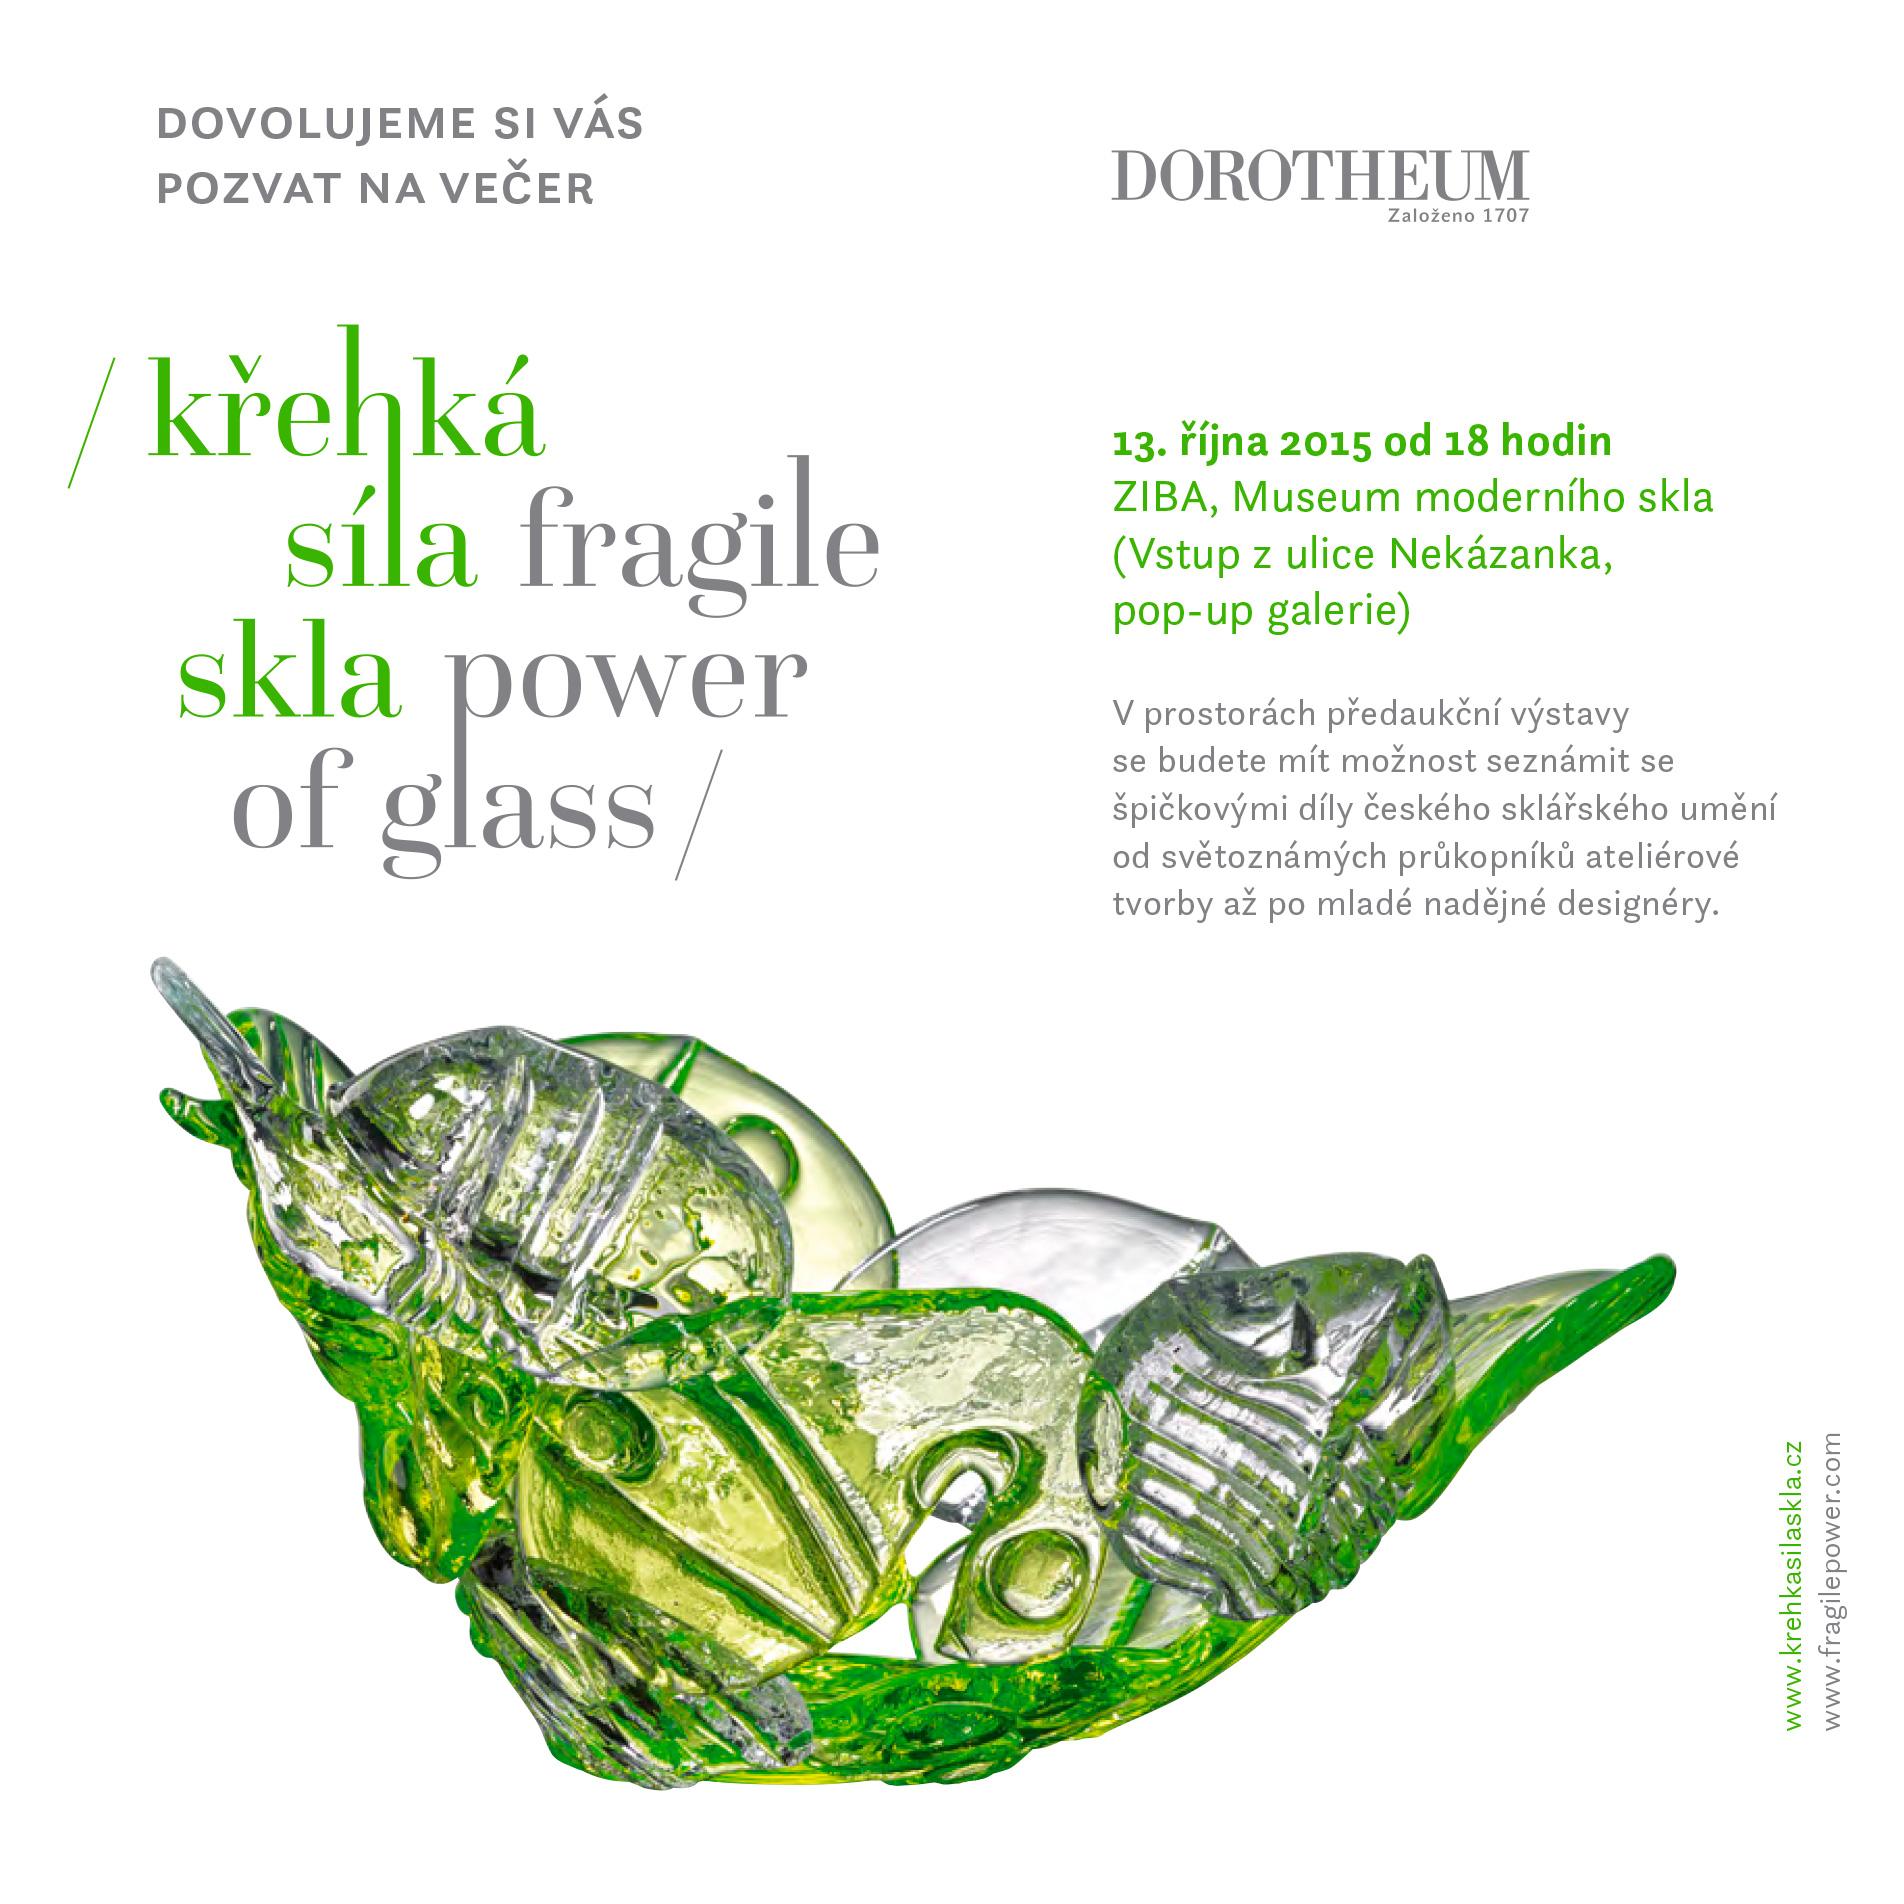 [album/Products_Model_Product/51/DOR_KSS_pozvanka_obecna_155x155.jpg]